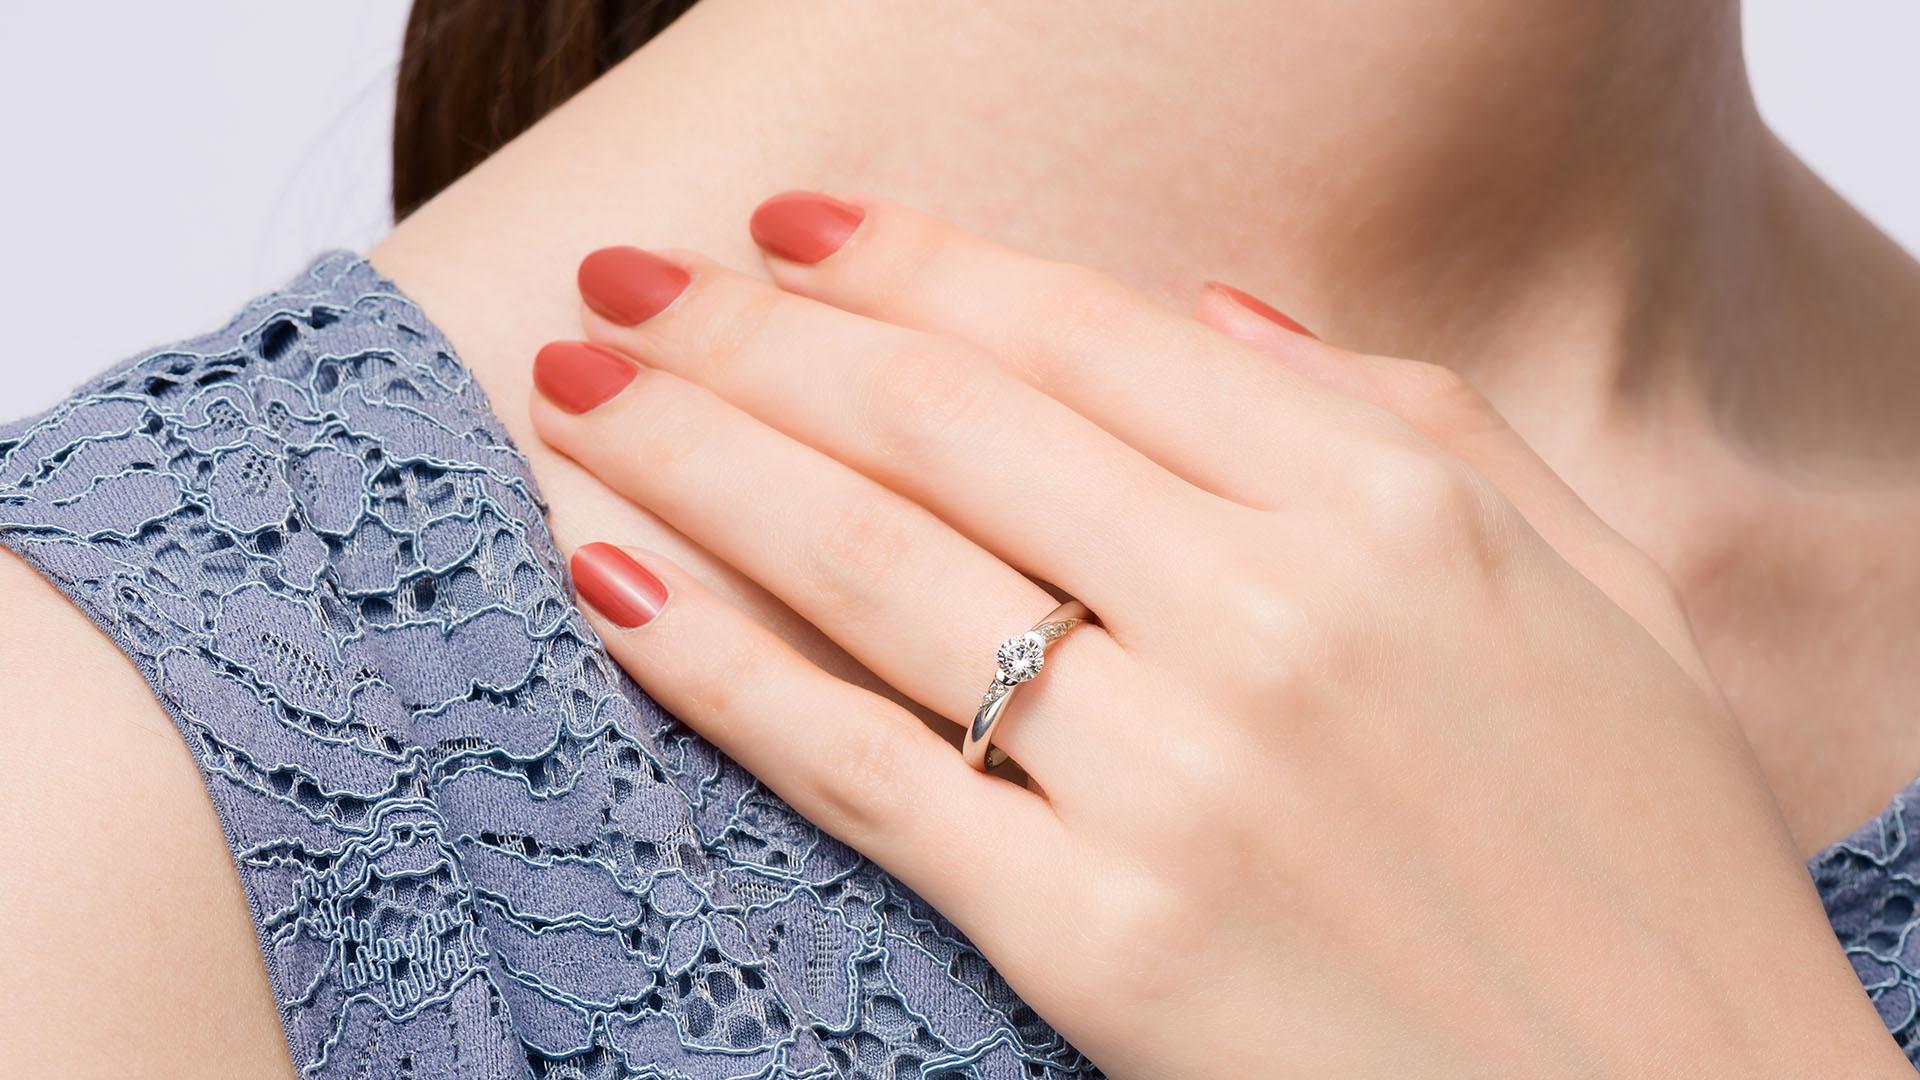 acrux アクルクス | 婚約指輪サムネイル 3